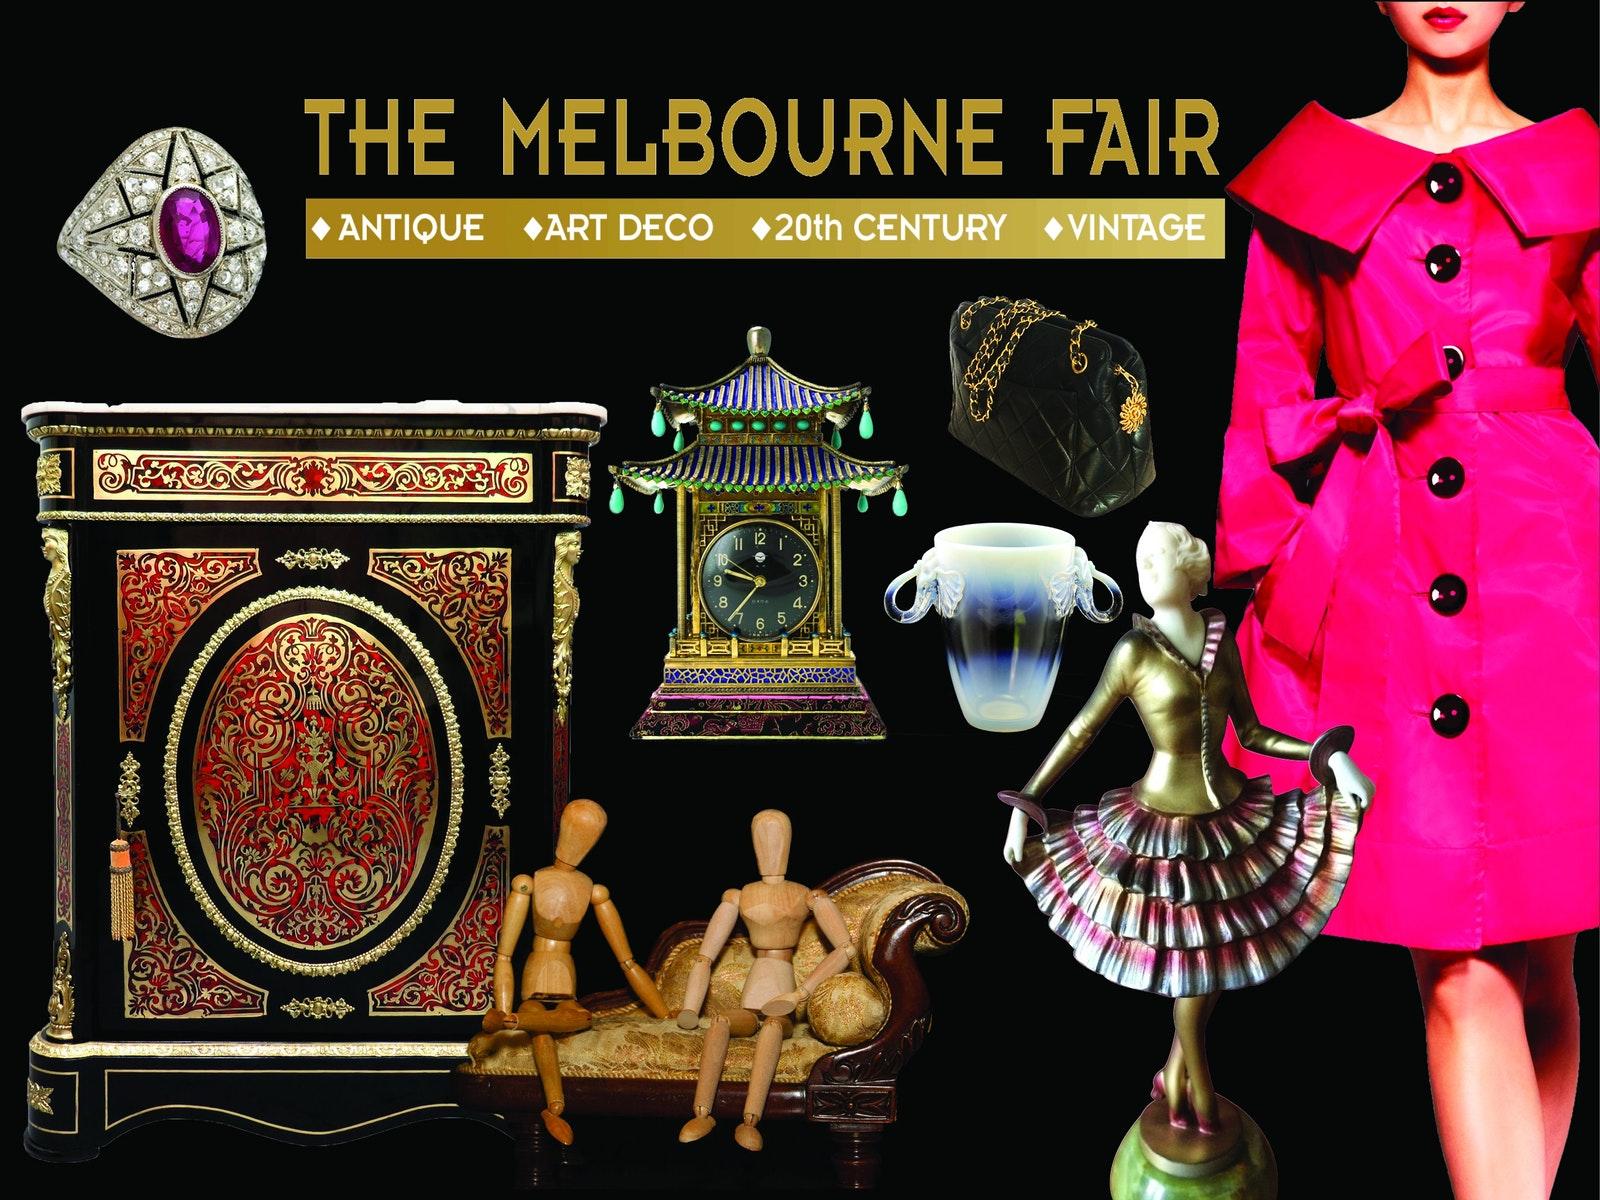 The Melbourne Fair